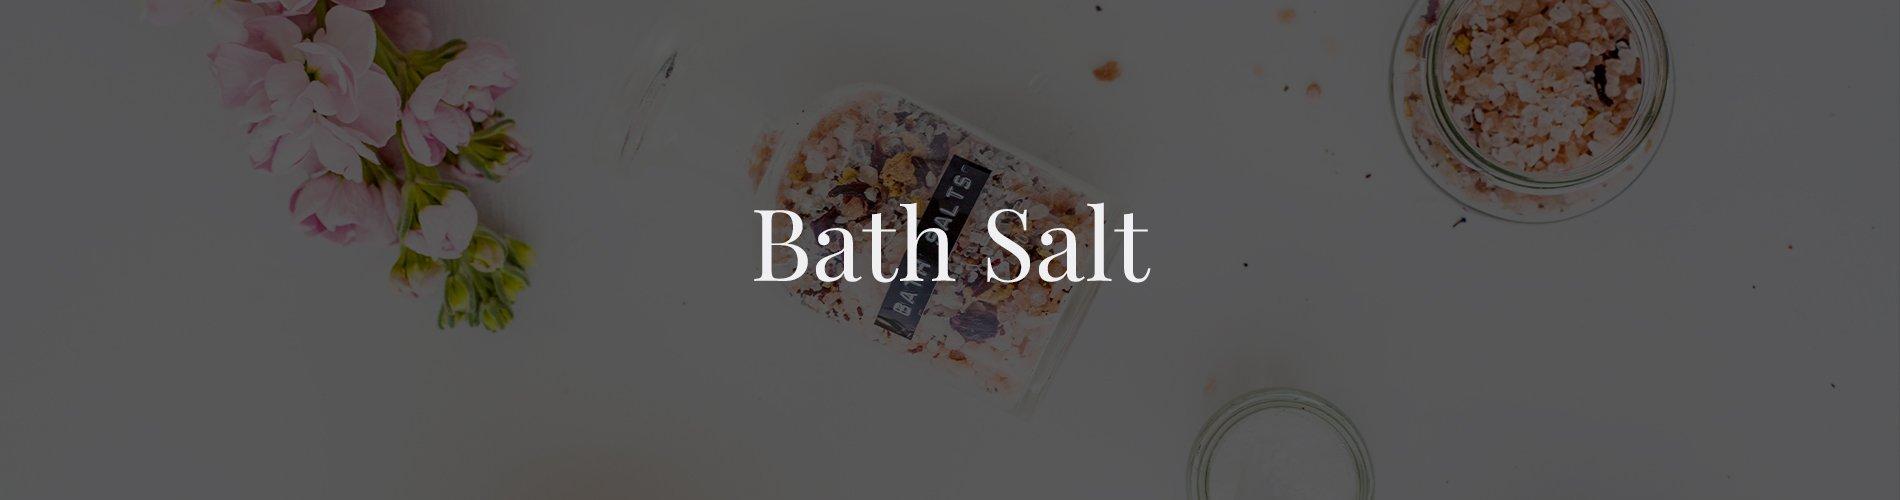 Bath salt Background Image